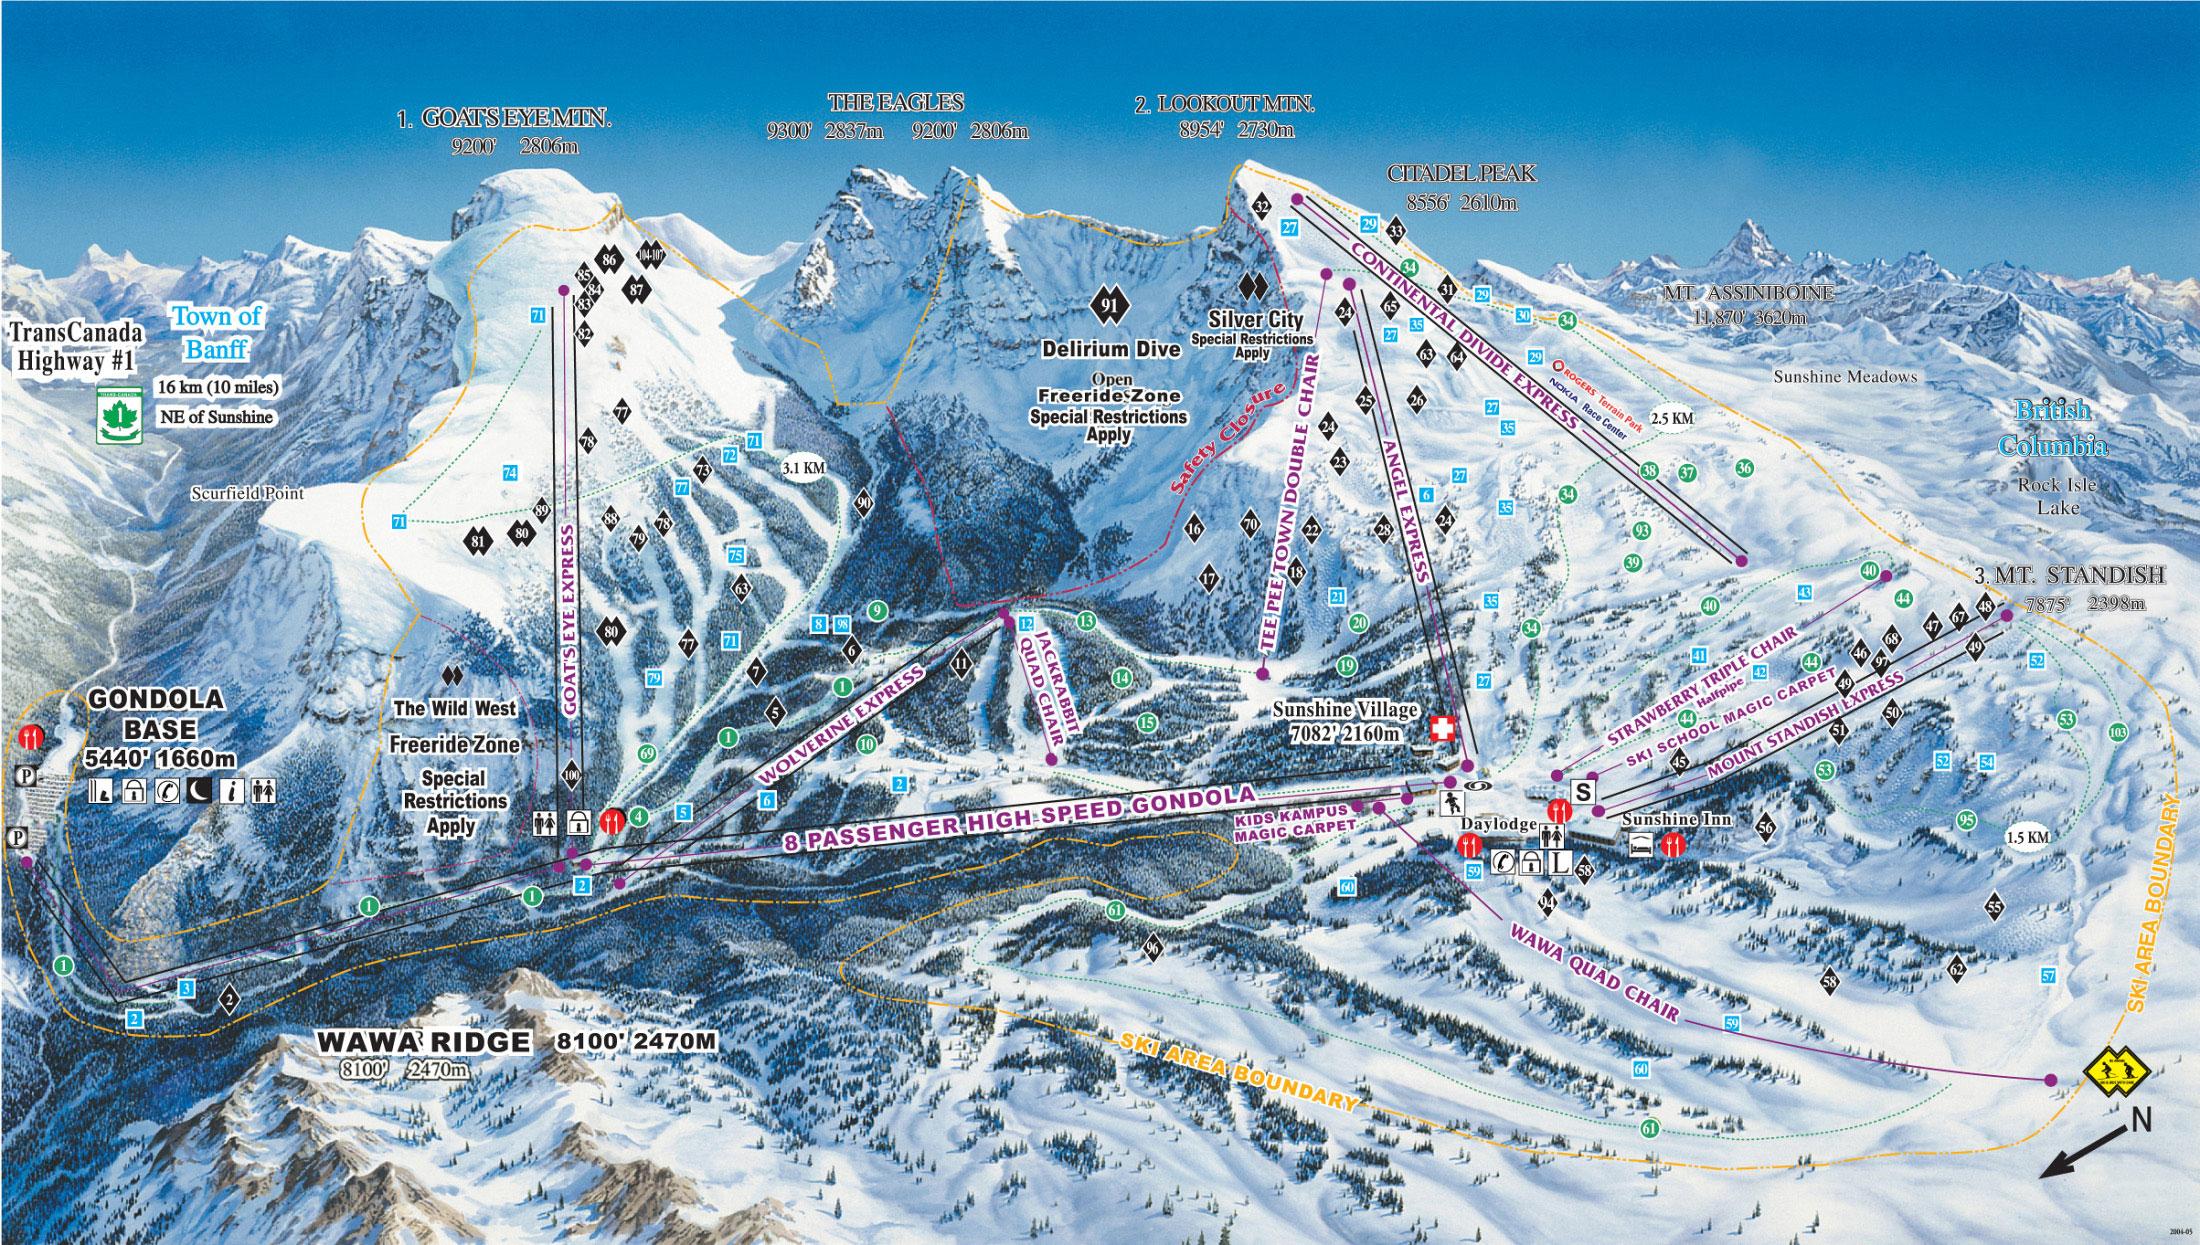 banff, canada - amazing ski adventures with alpine adventuresalpine